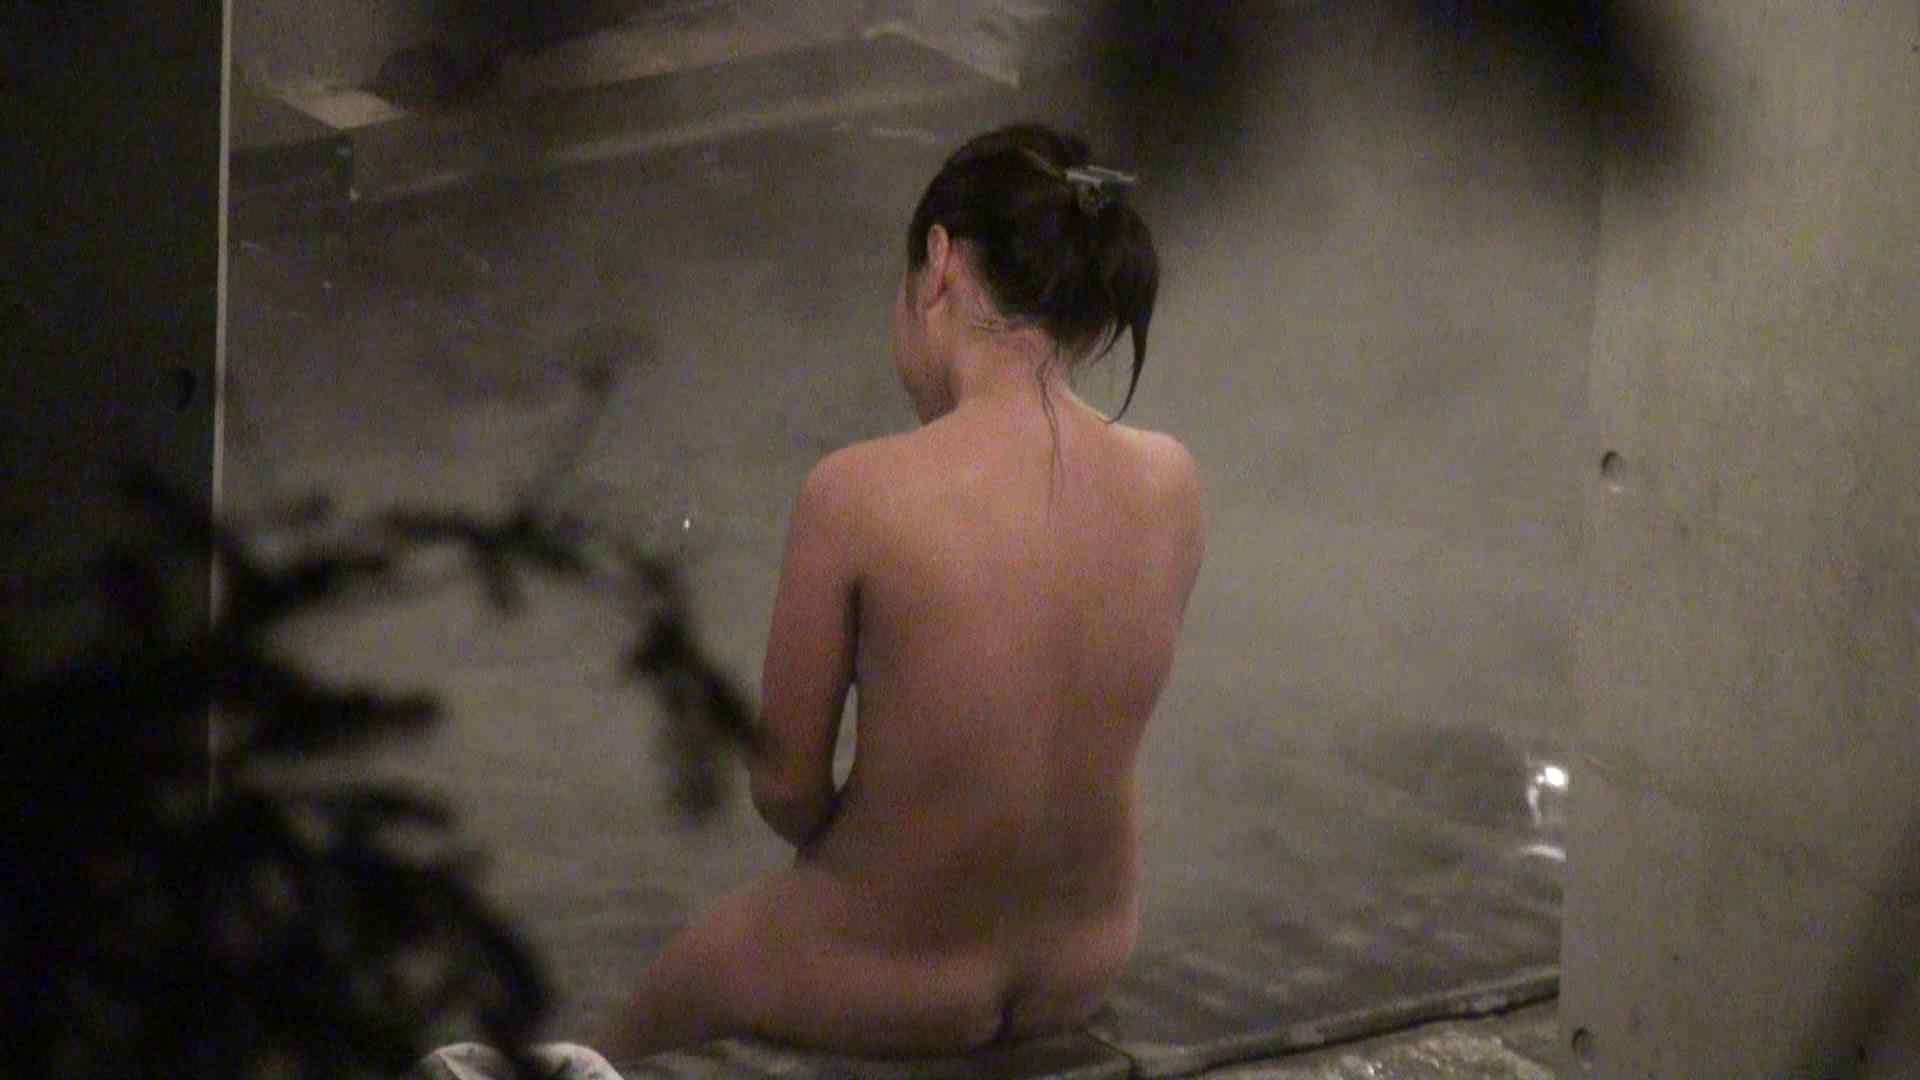 Aquaな露天風呂Vol.407 0   0  67連発 46